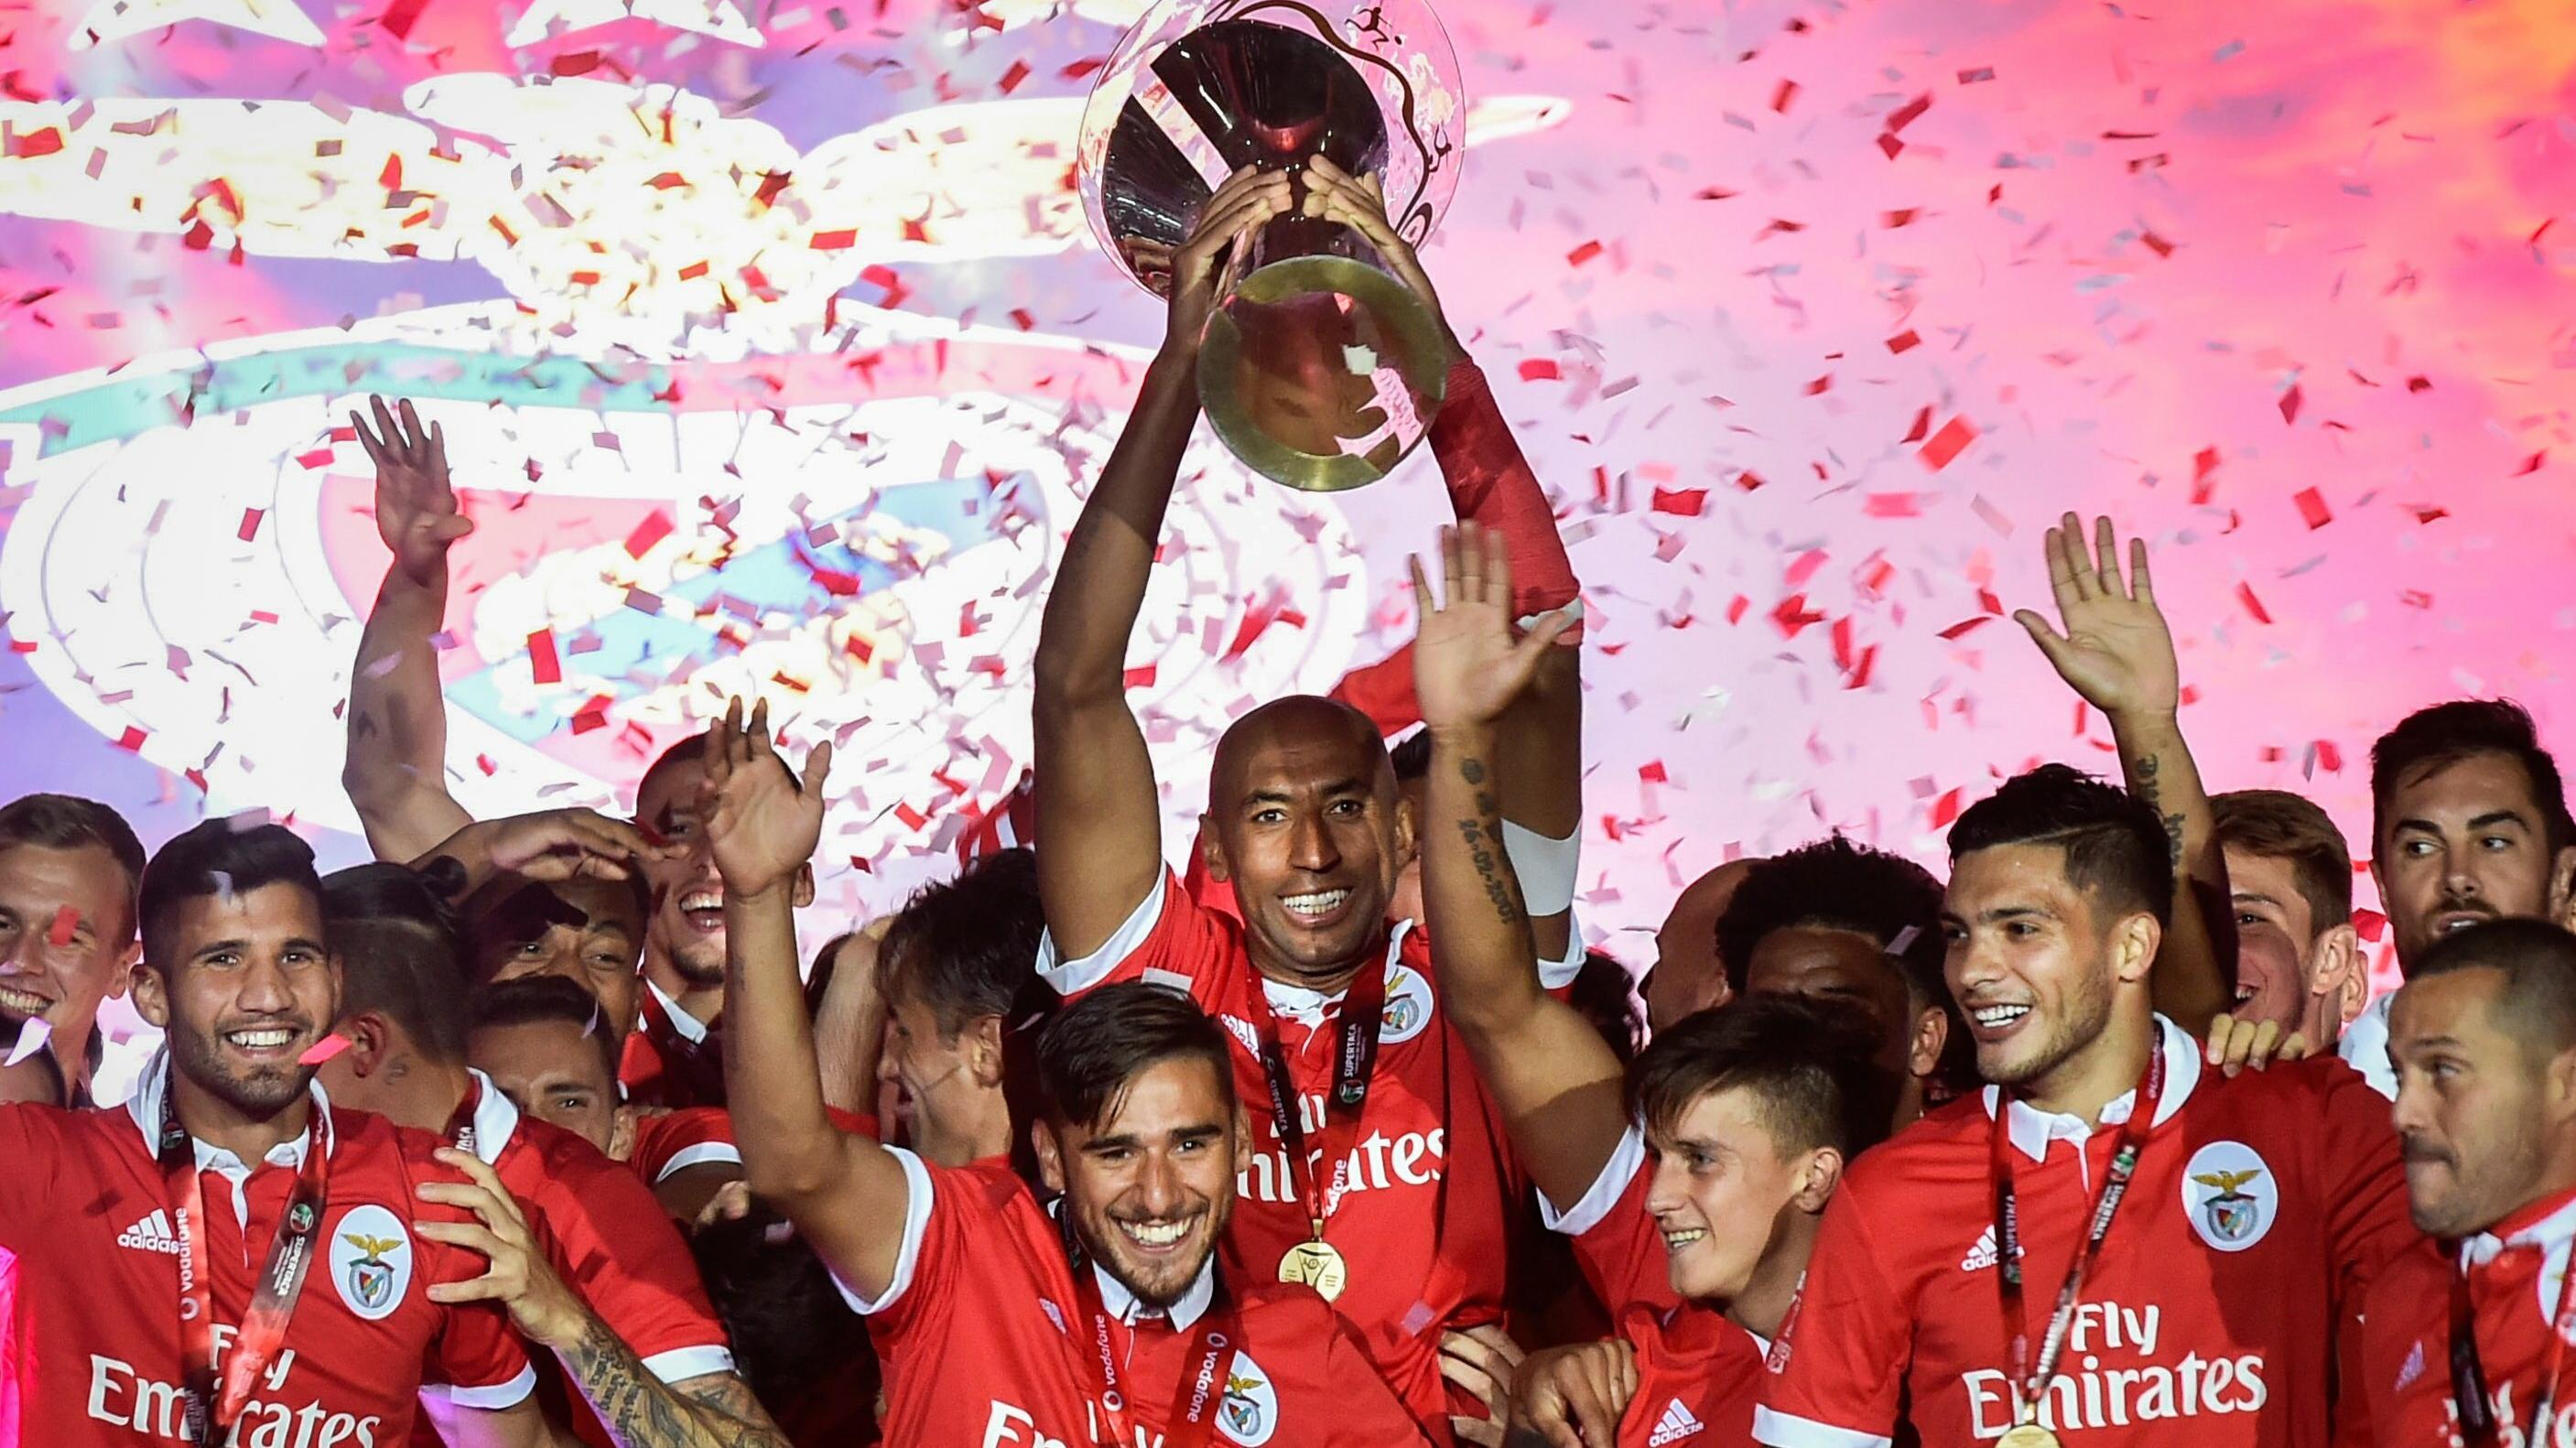 d1186101e Benfica zdobywcą Superpucharu Portugalii - Piłka nożna